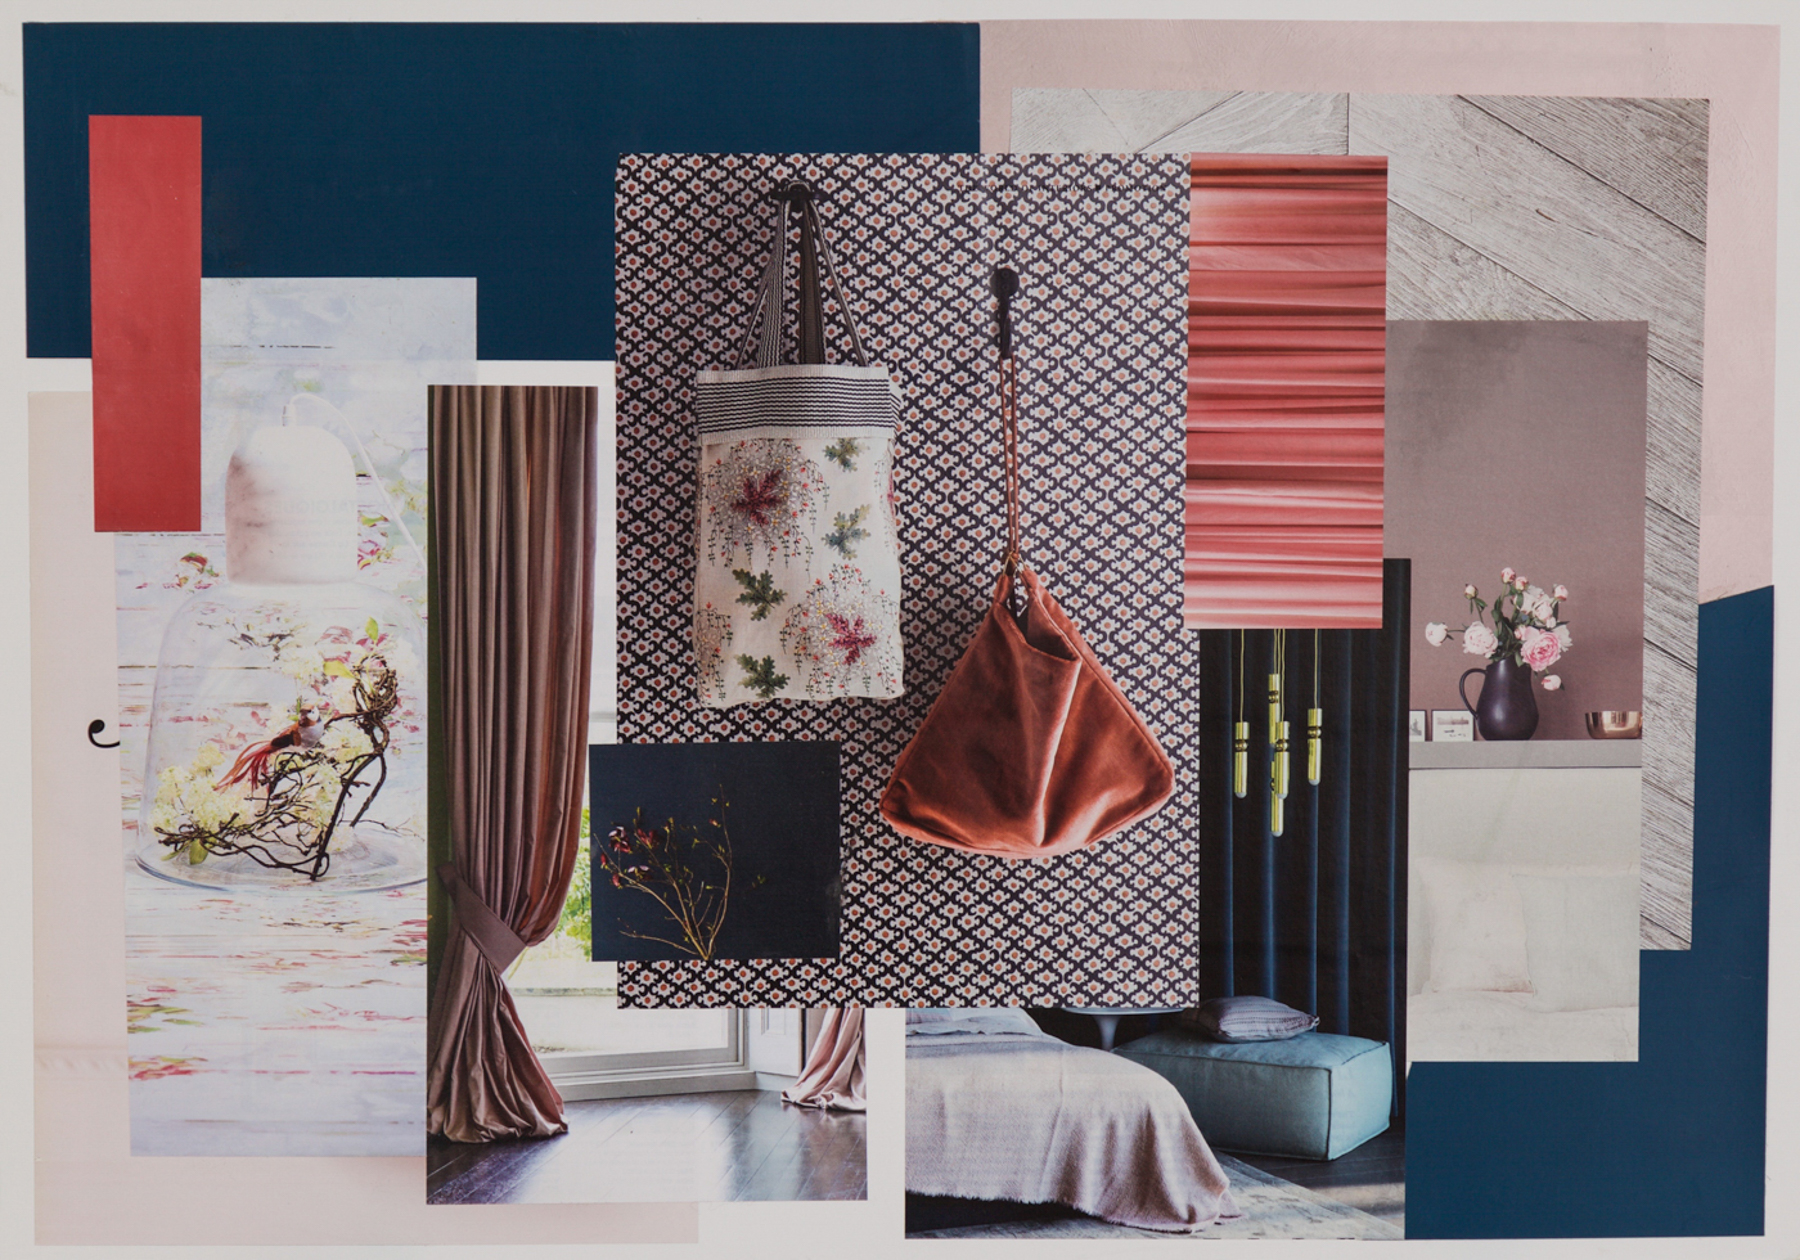 Interior_Design-1960.jpg